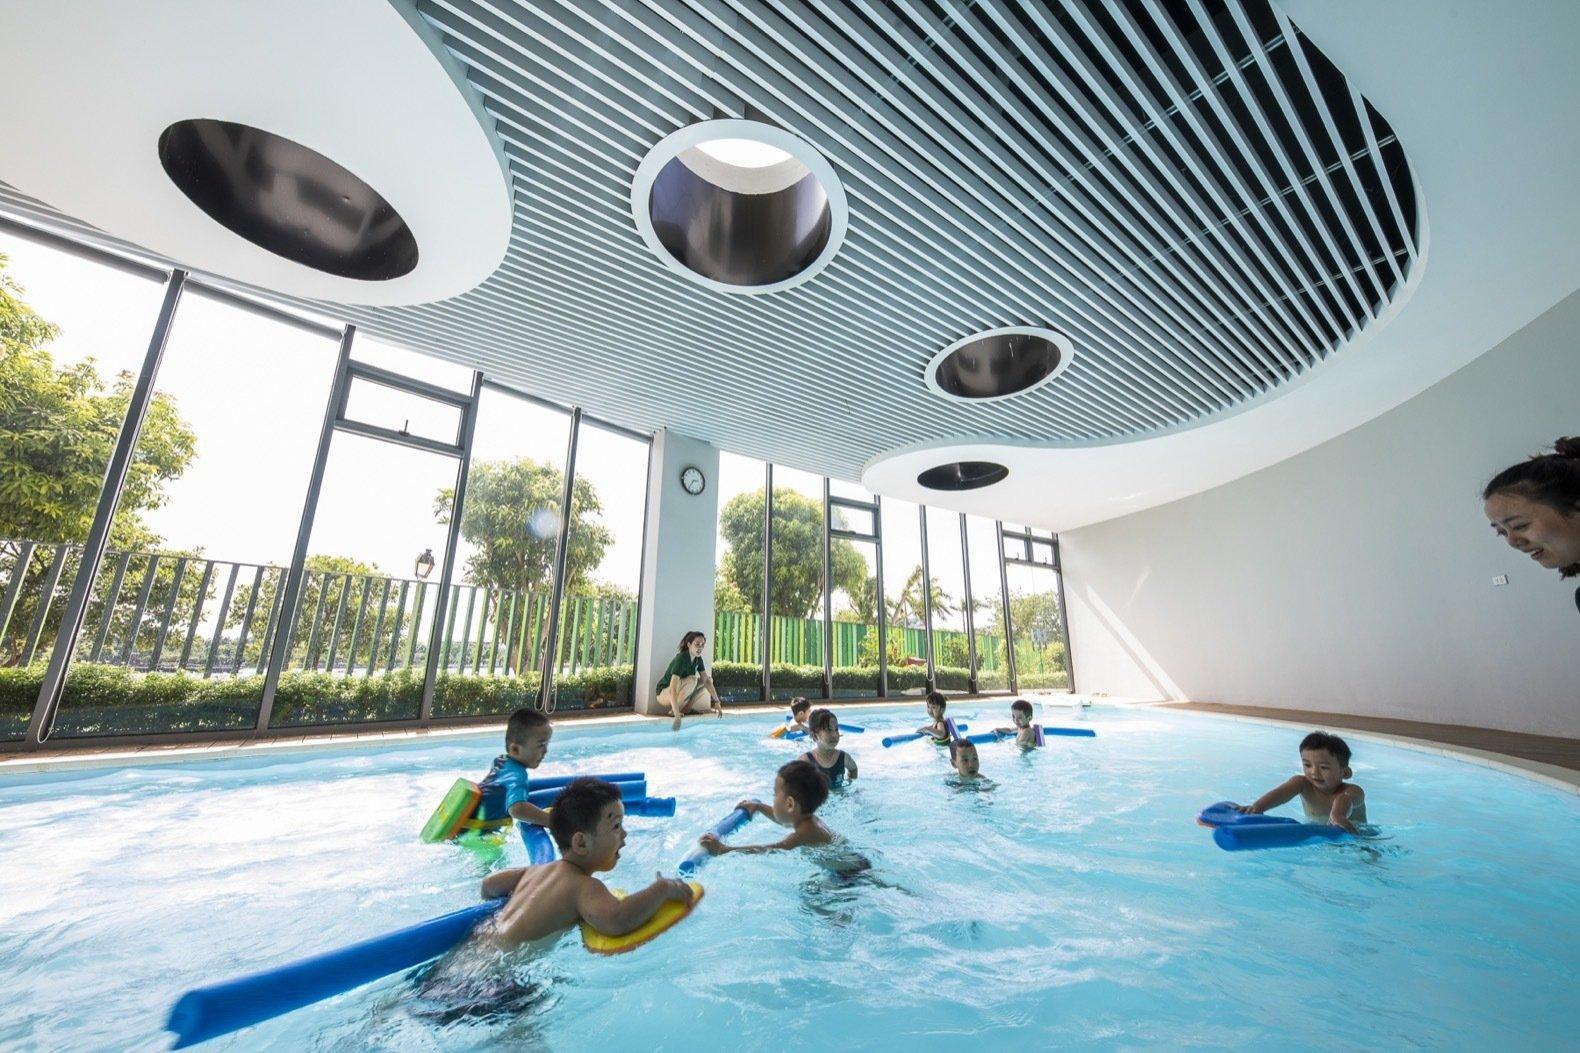 Eco Kindi swimming pool